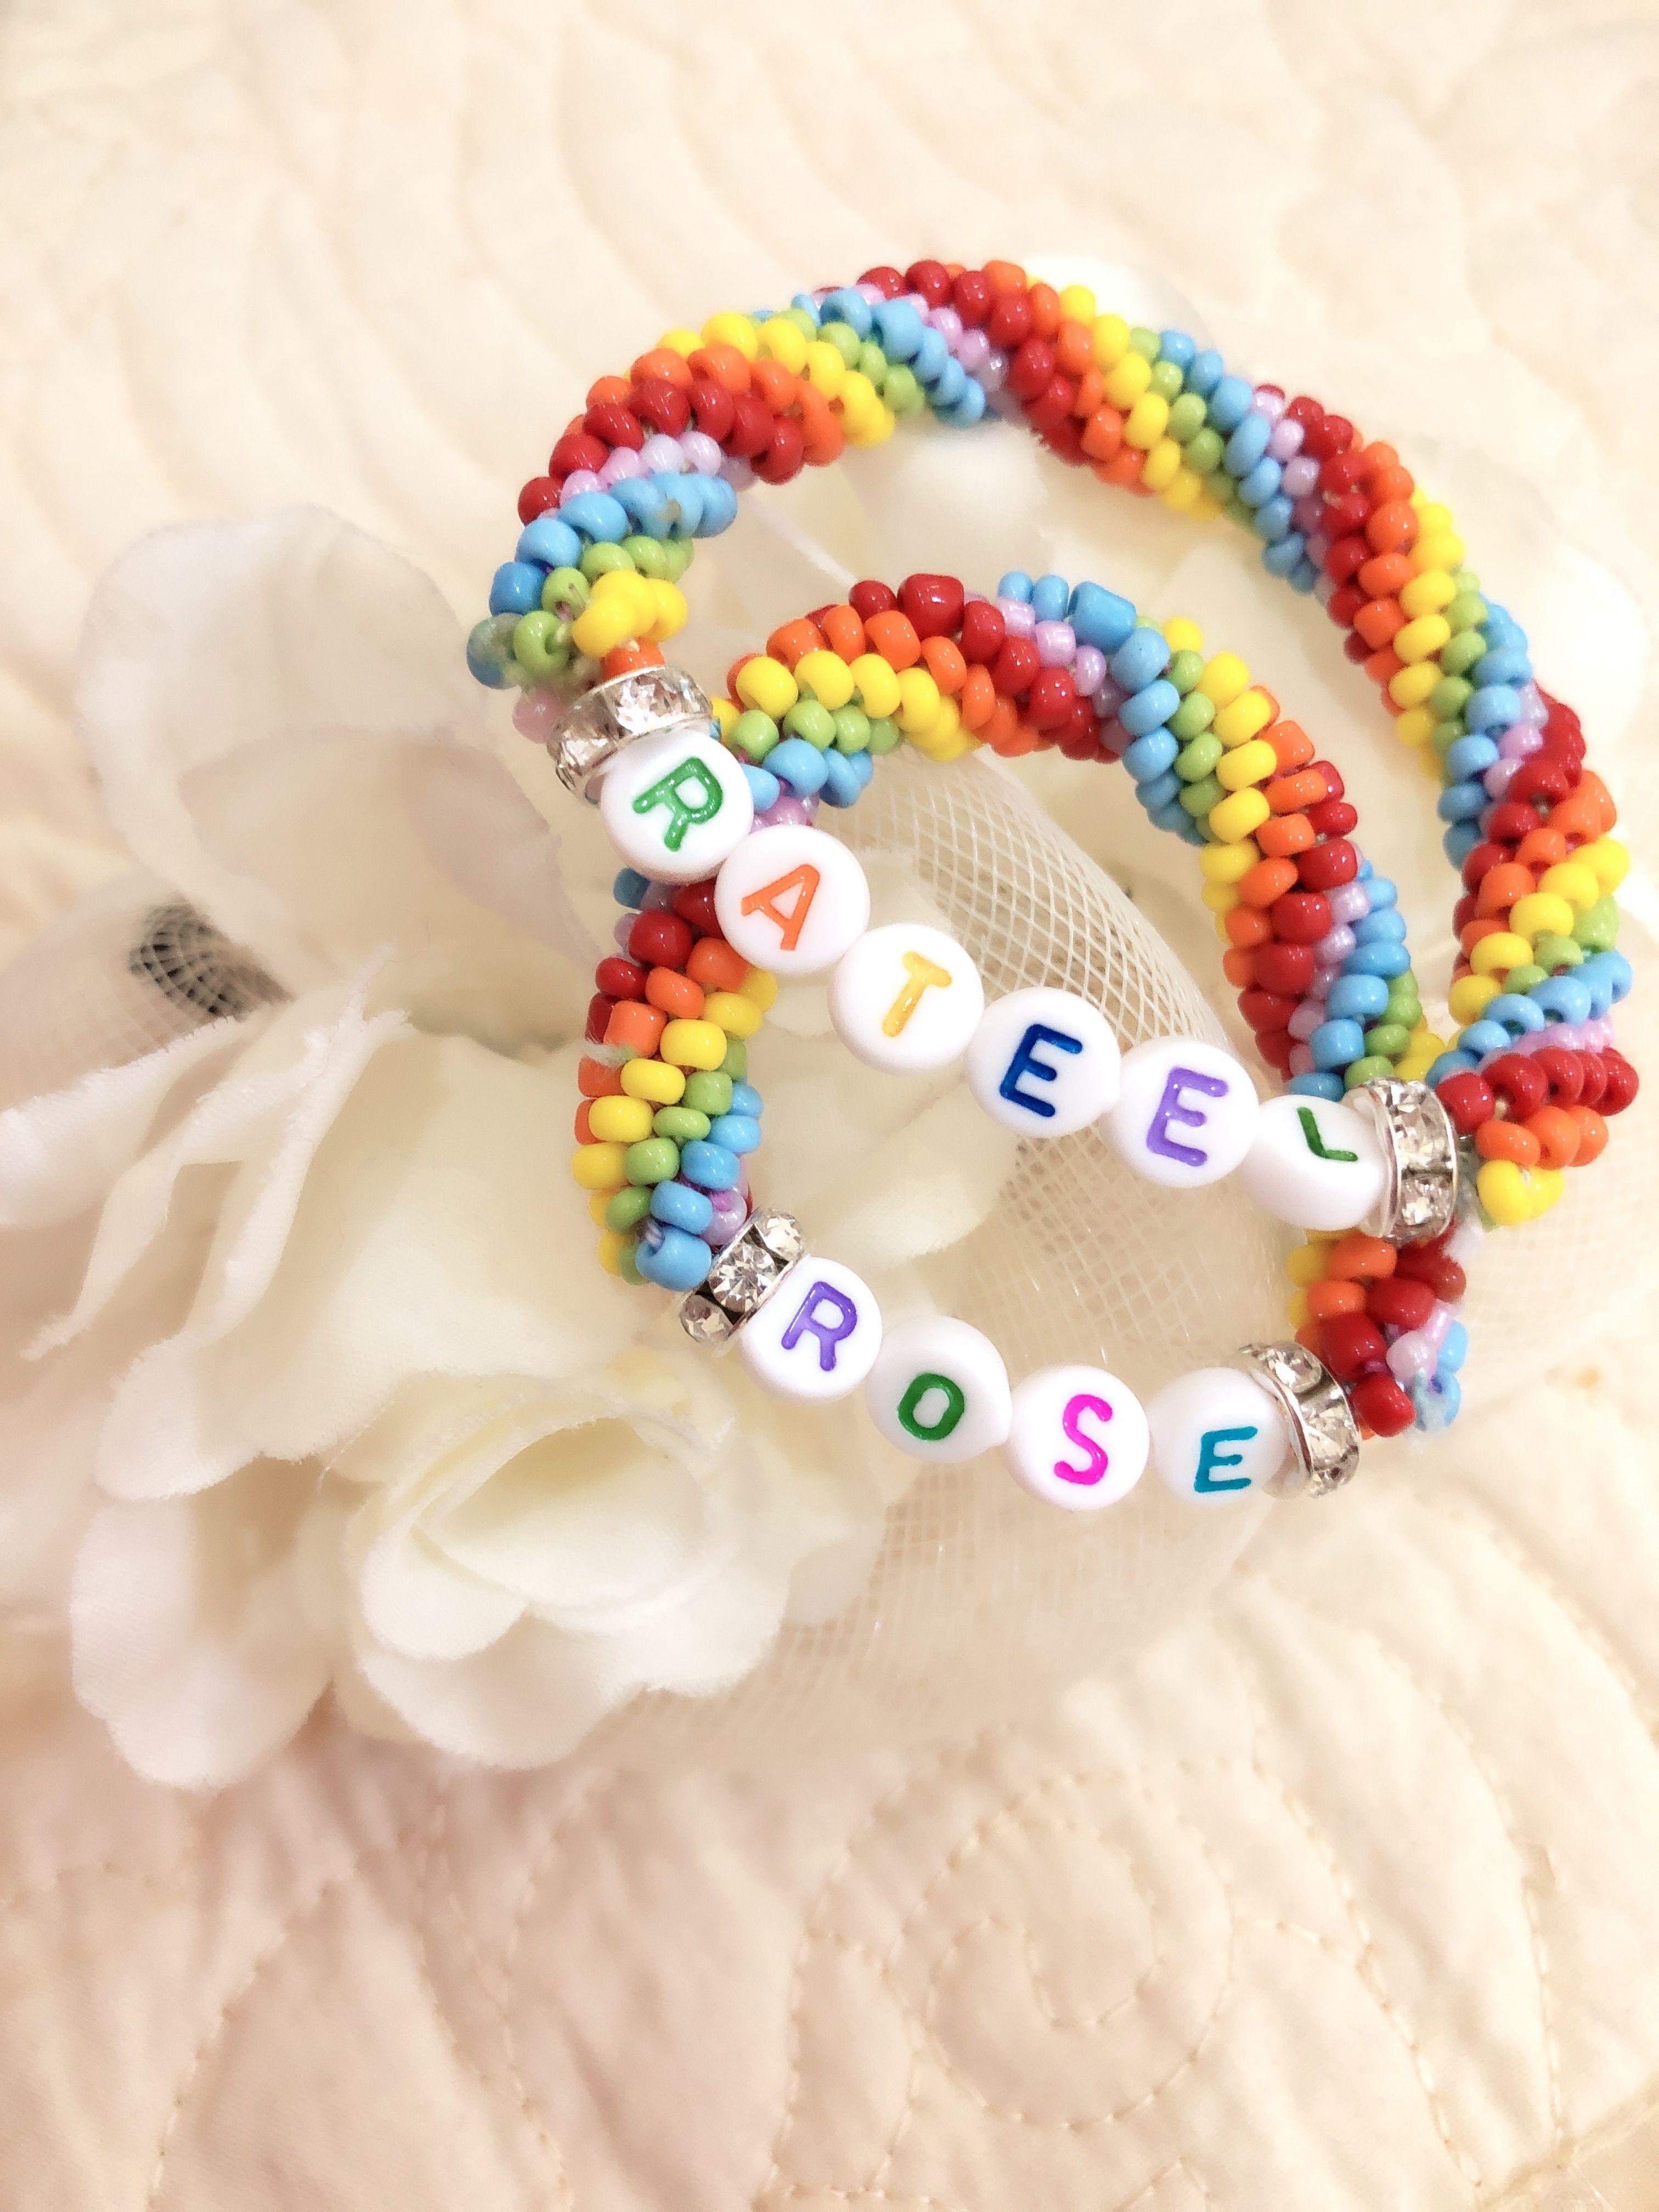 Beads Fot Baby S Girls Embroidered Friendship Bracelet Beads S Girls